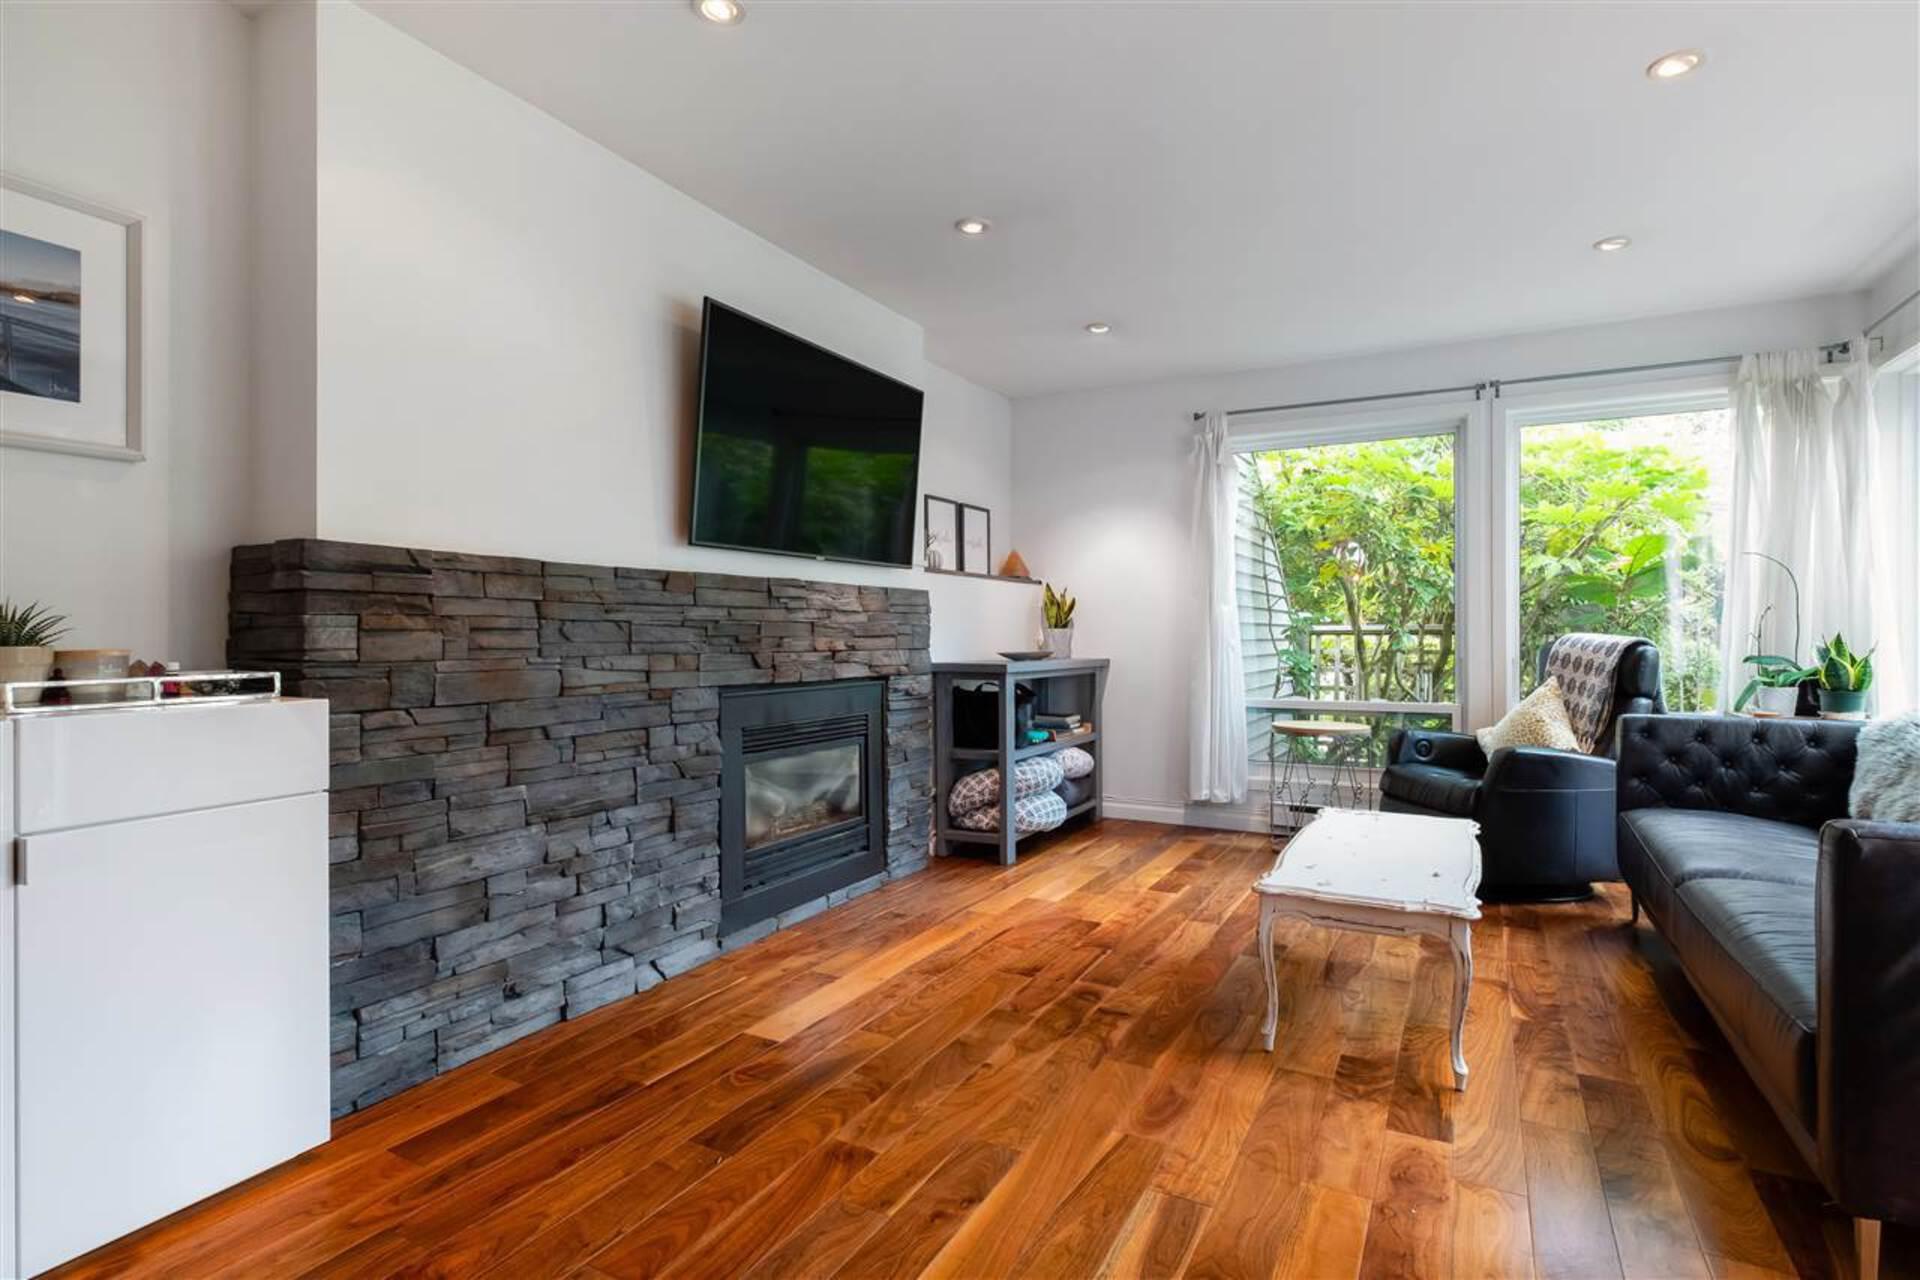 2536-cornwall-avenue-kitsilano-vancouver-west-04 at 2536 Cornwall Avenue, Kitsilano, Vancouver West